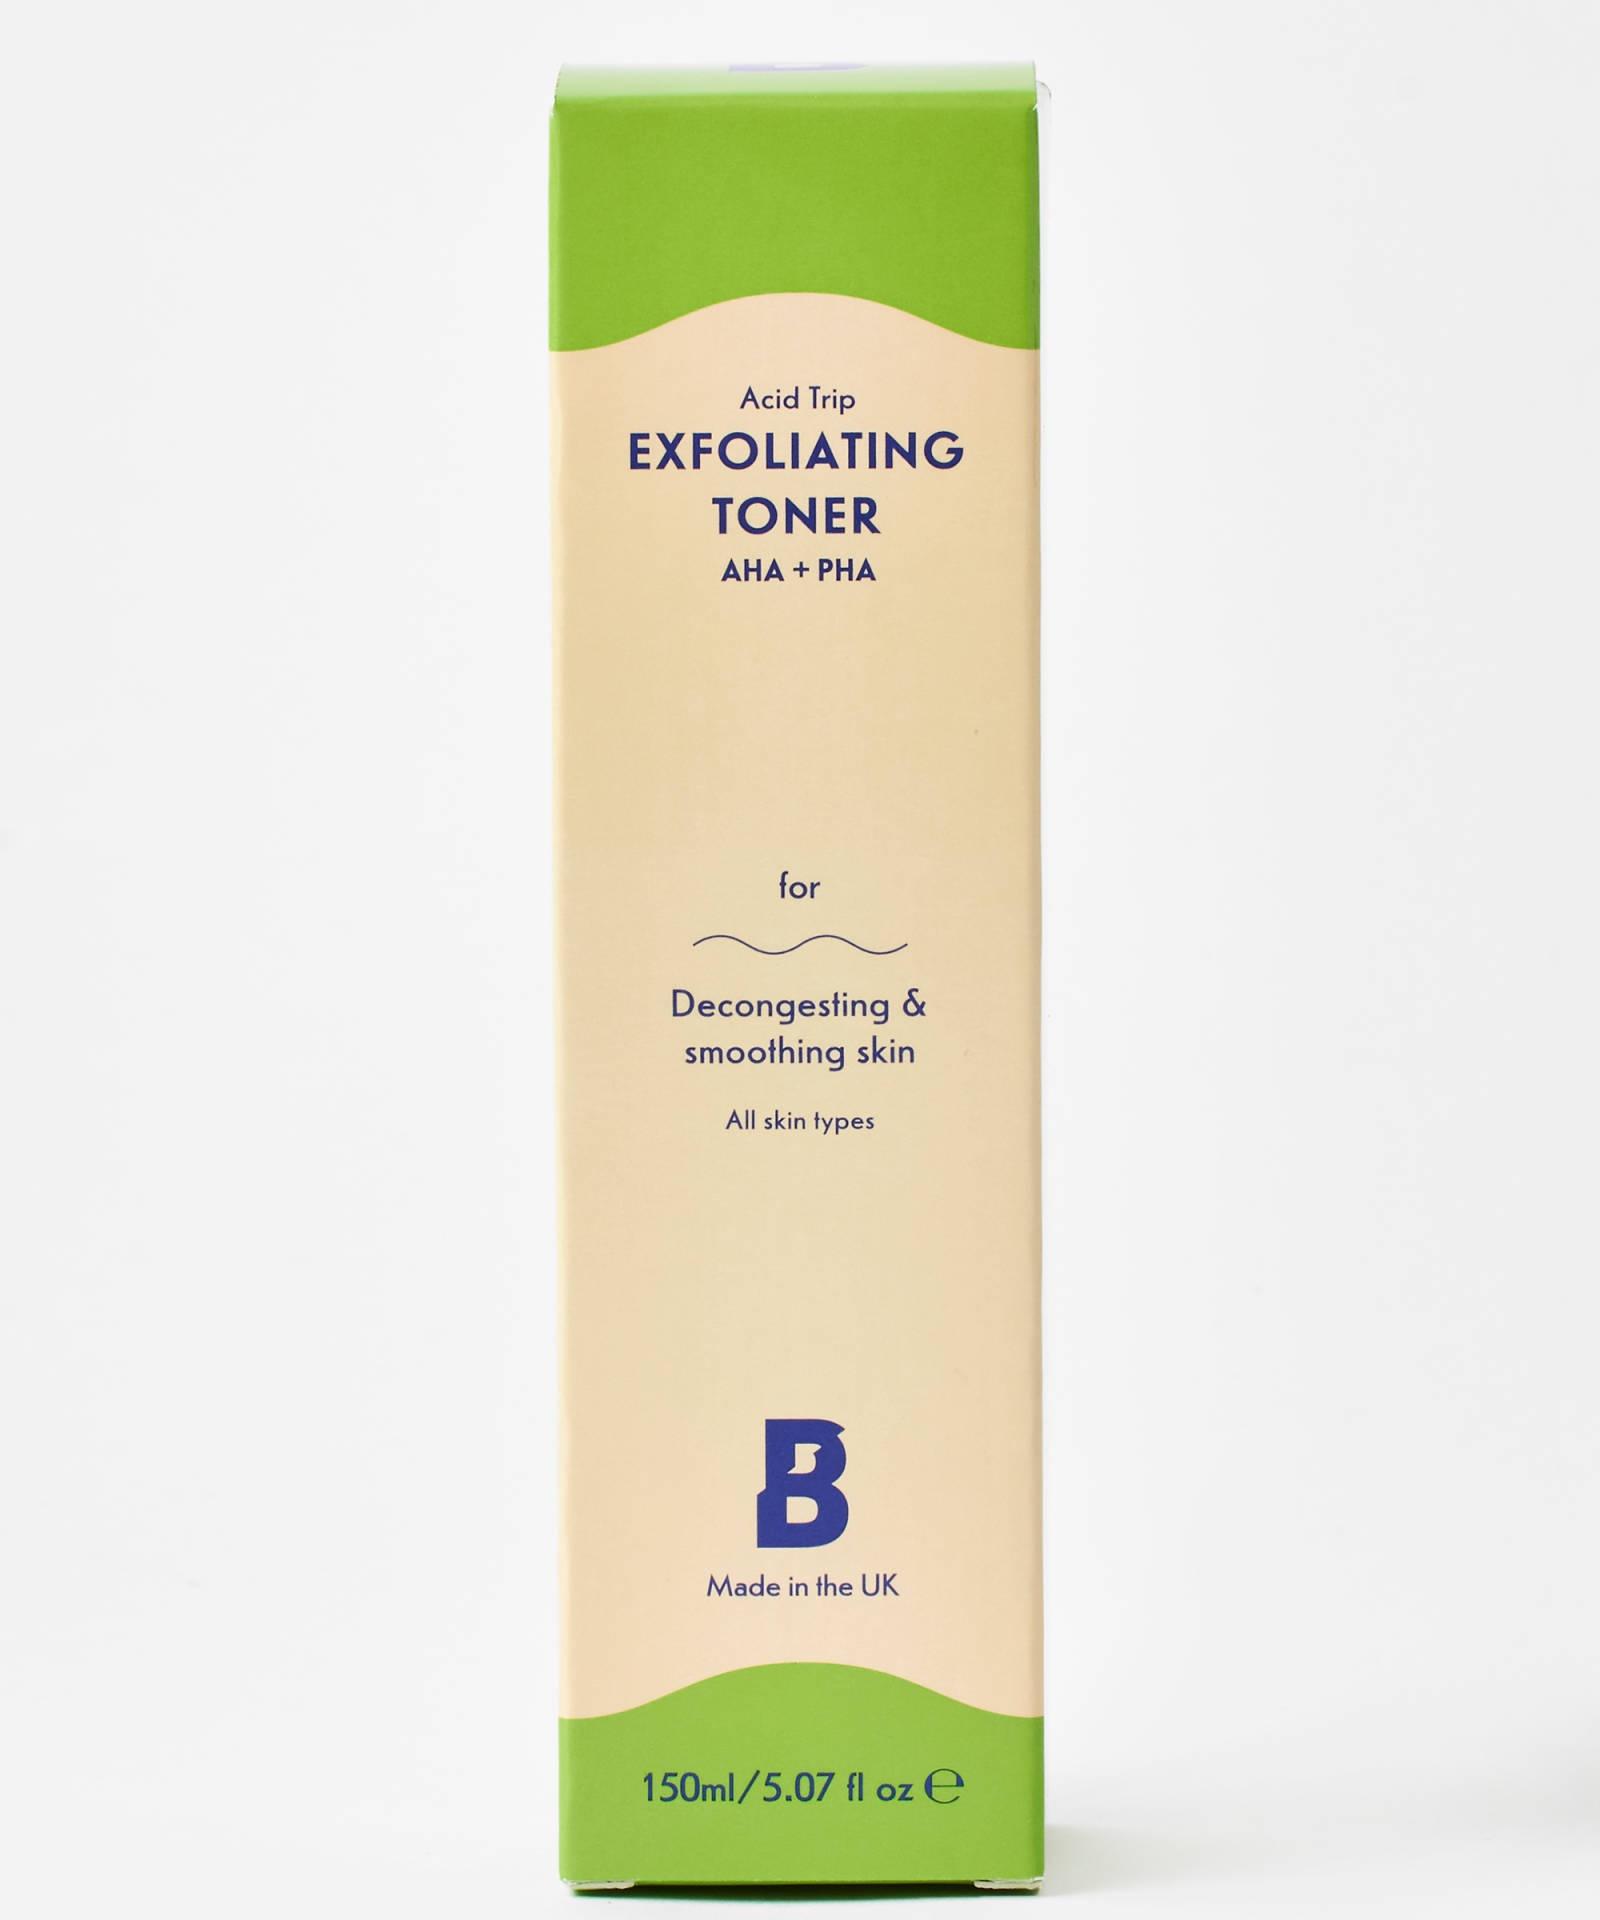 Beauty Bay Acid Trip Exfoliating Toner